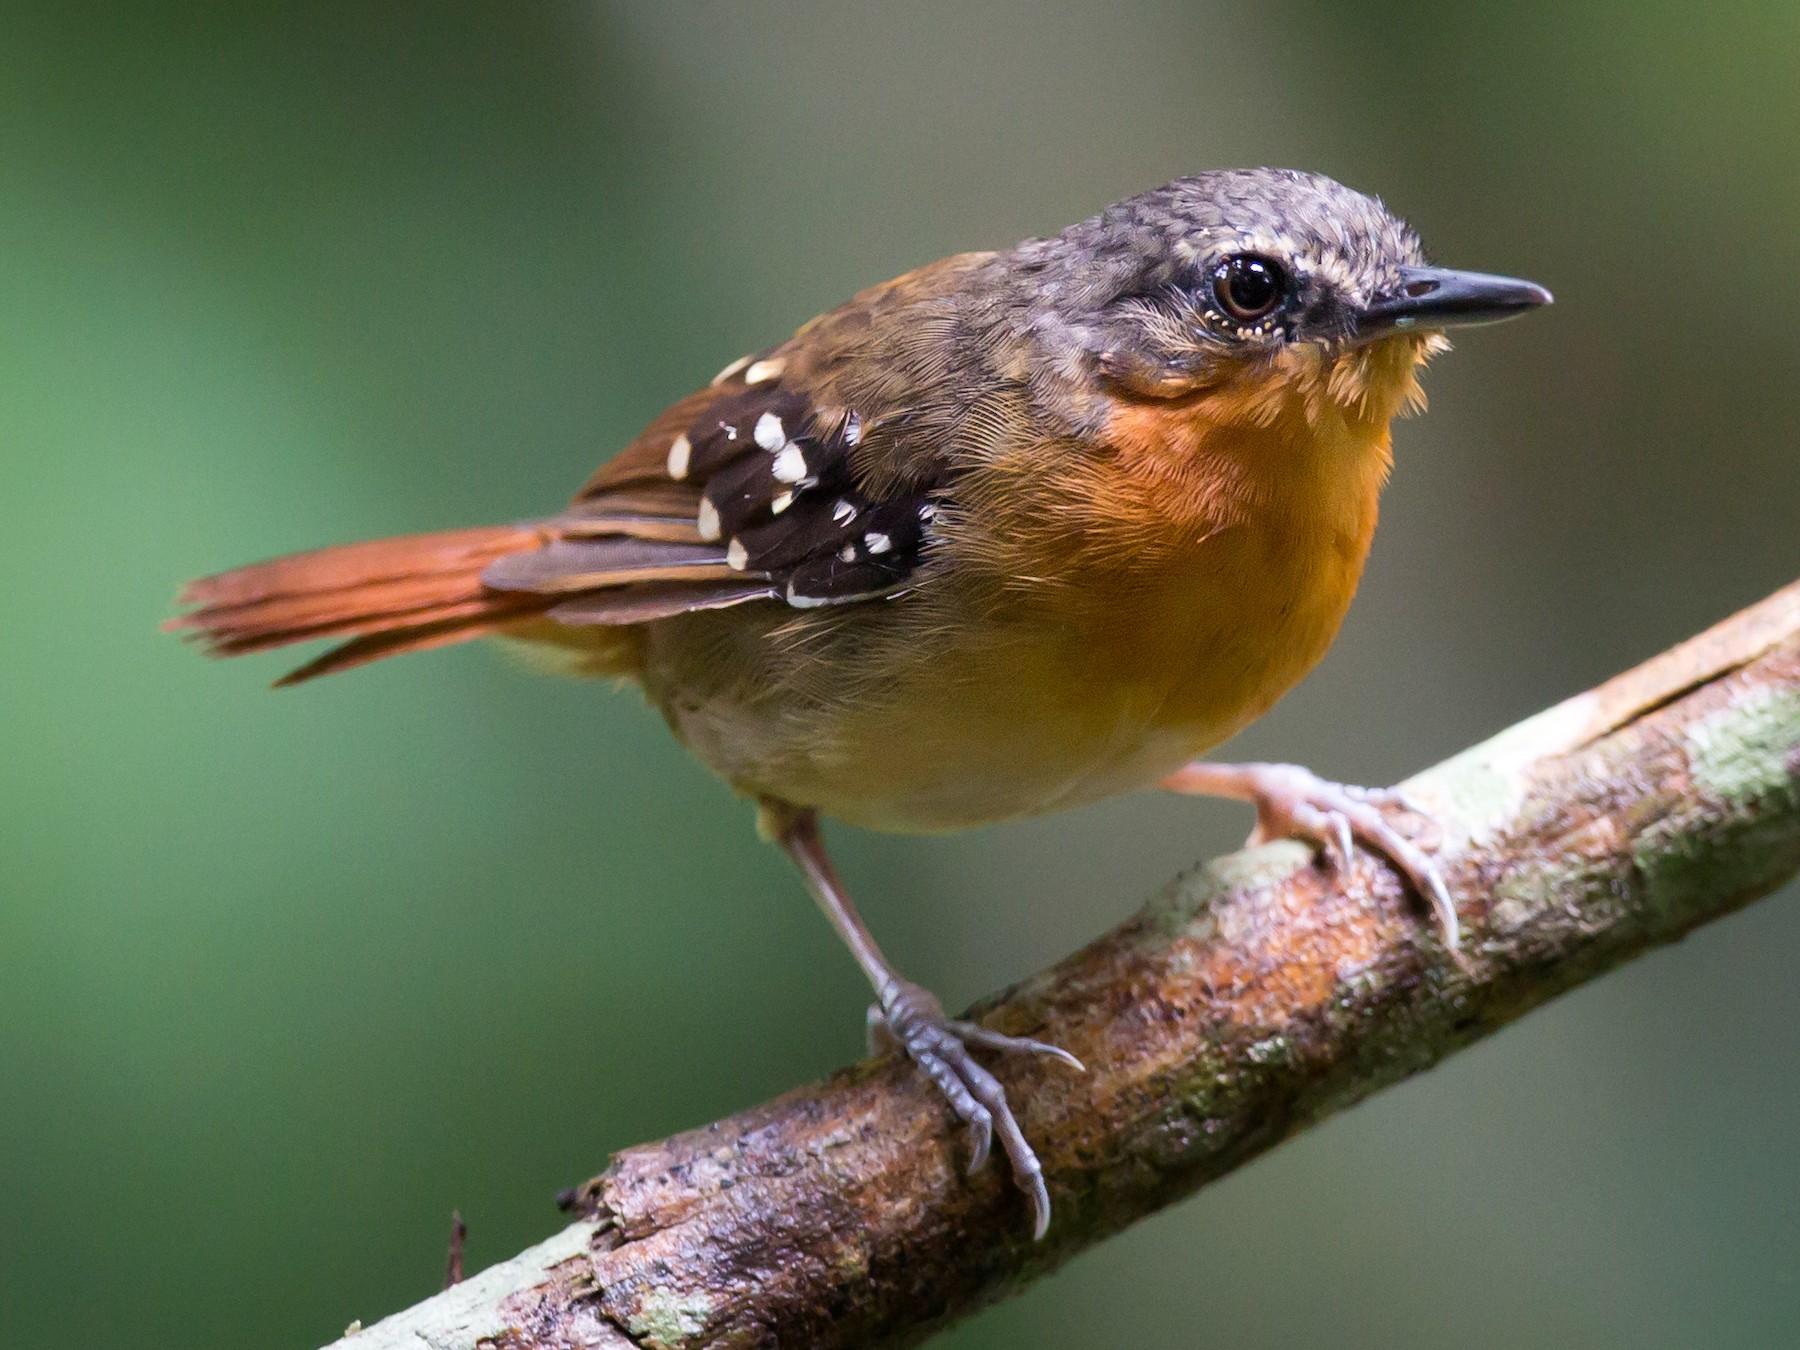 Chestnut-tailed Antbird - Bernardo Roca-Rey Ross